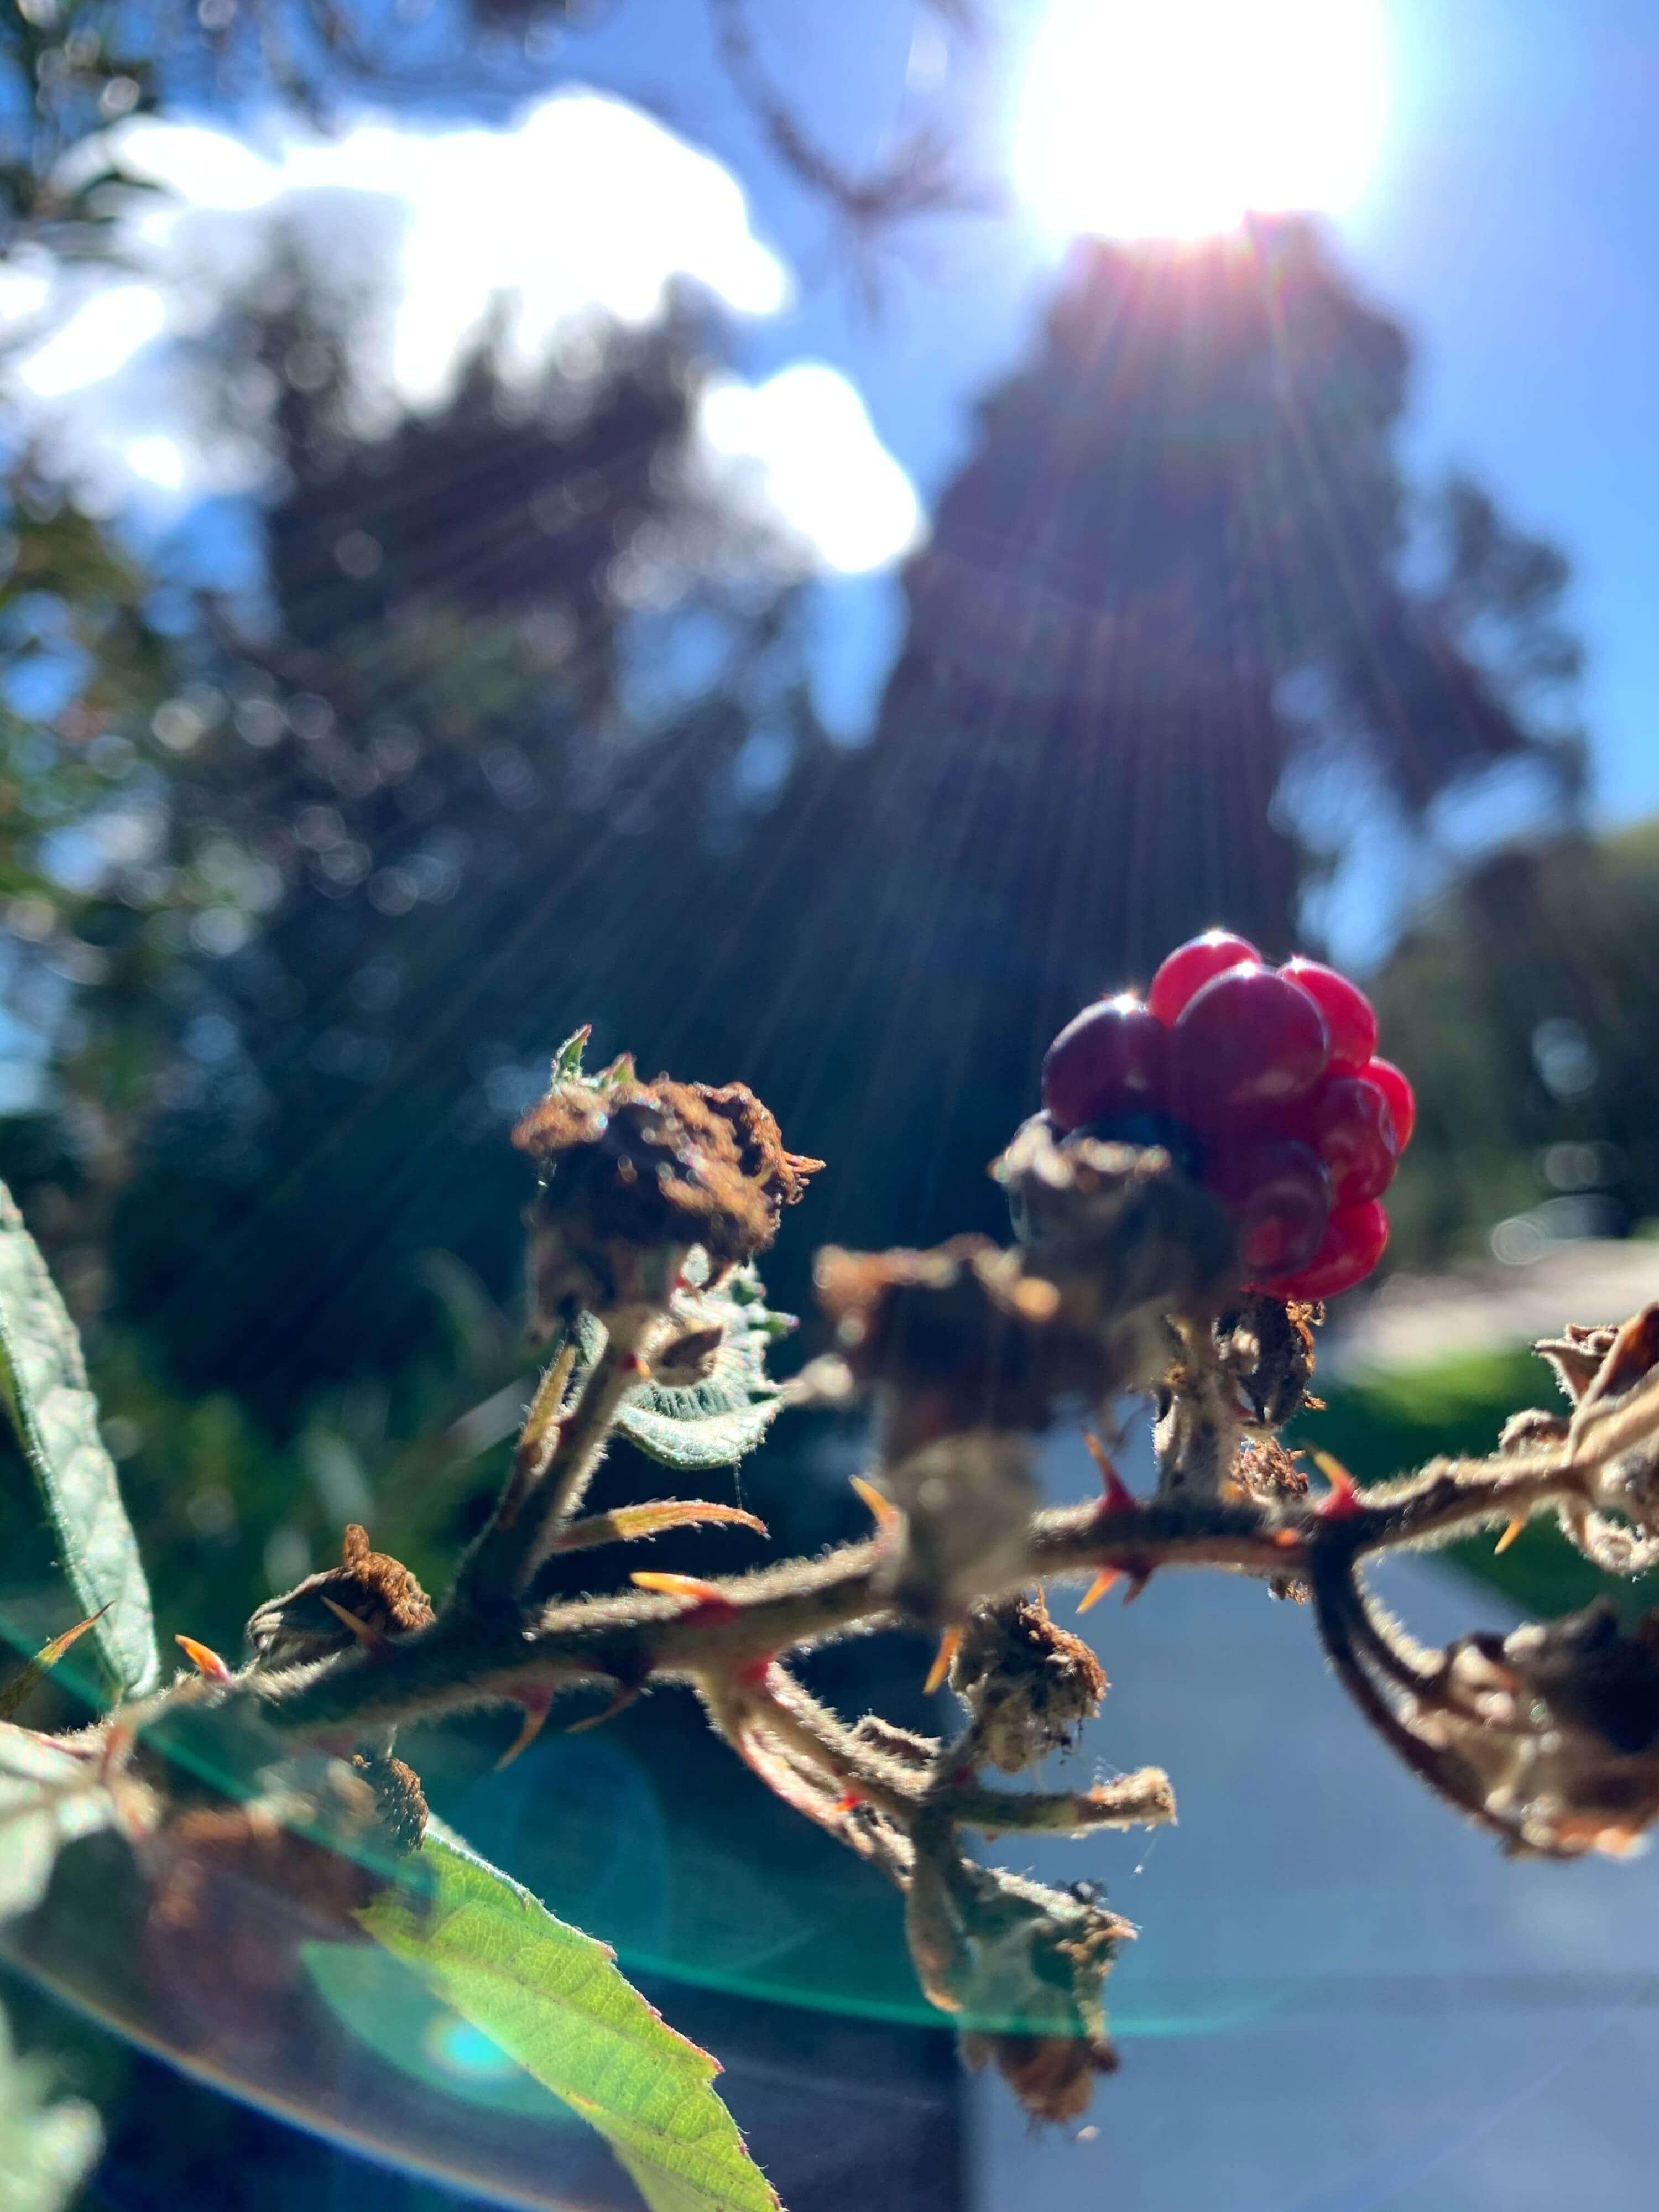 sunlight reflecting on a raspberry bush